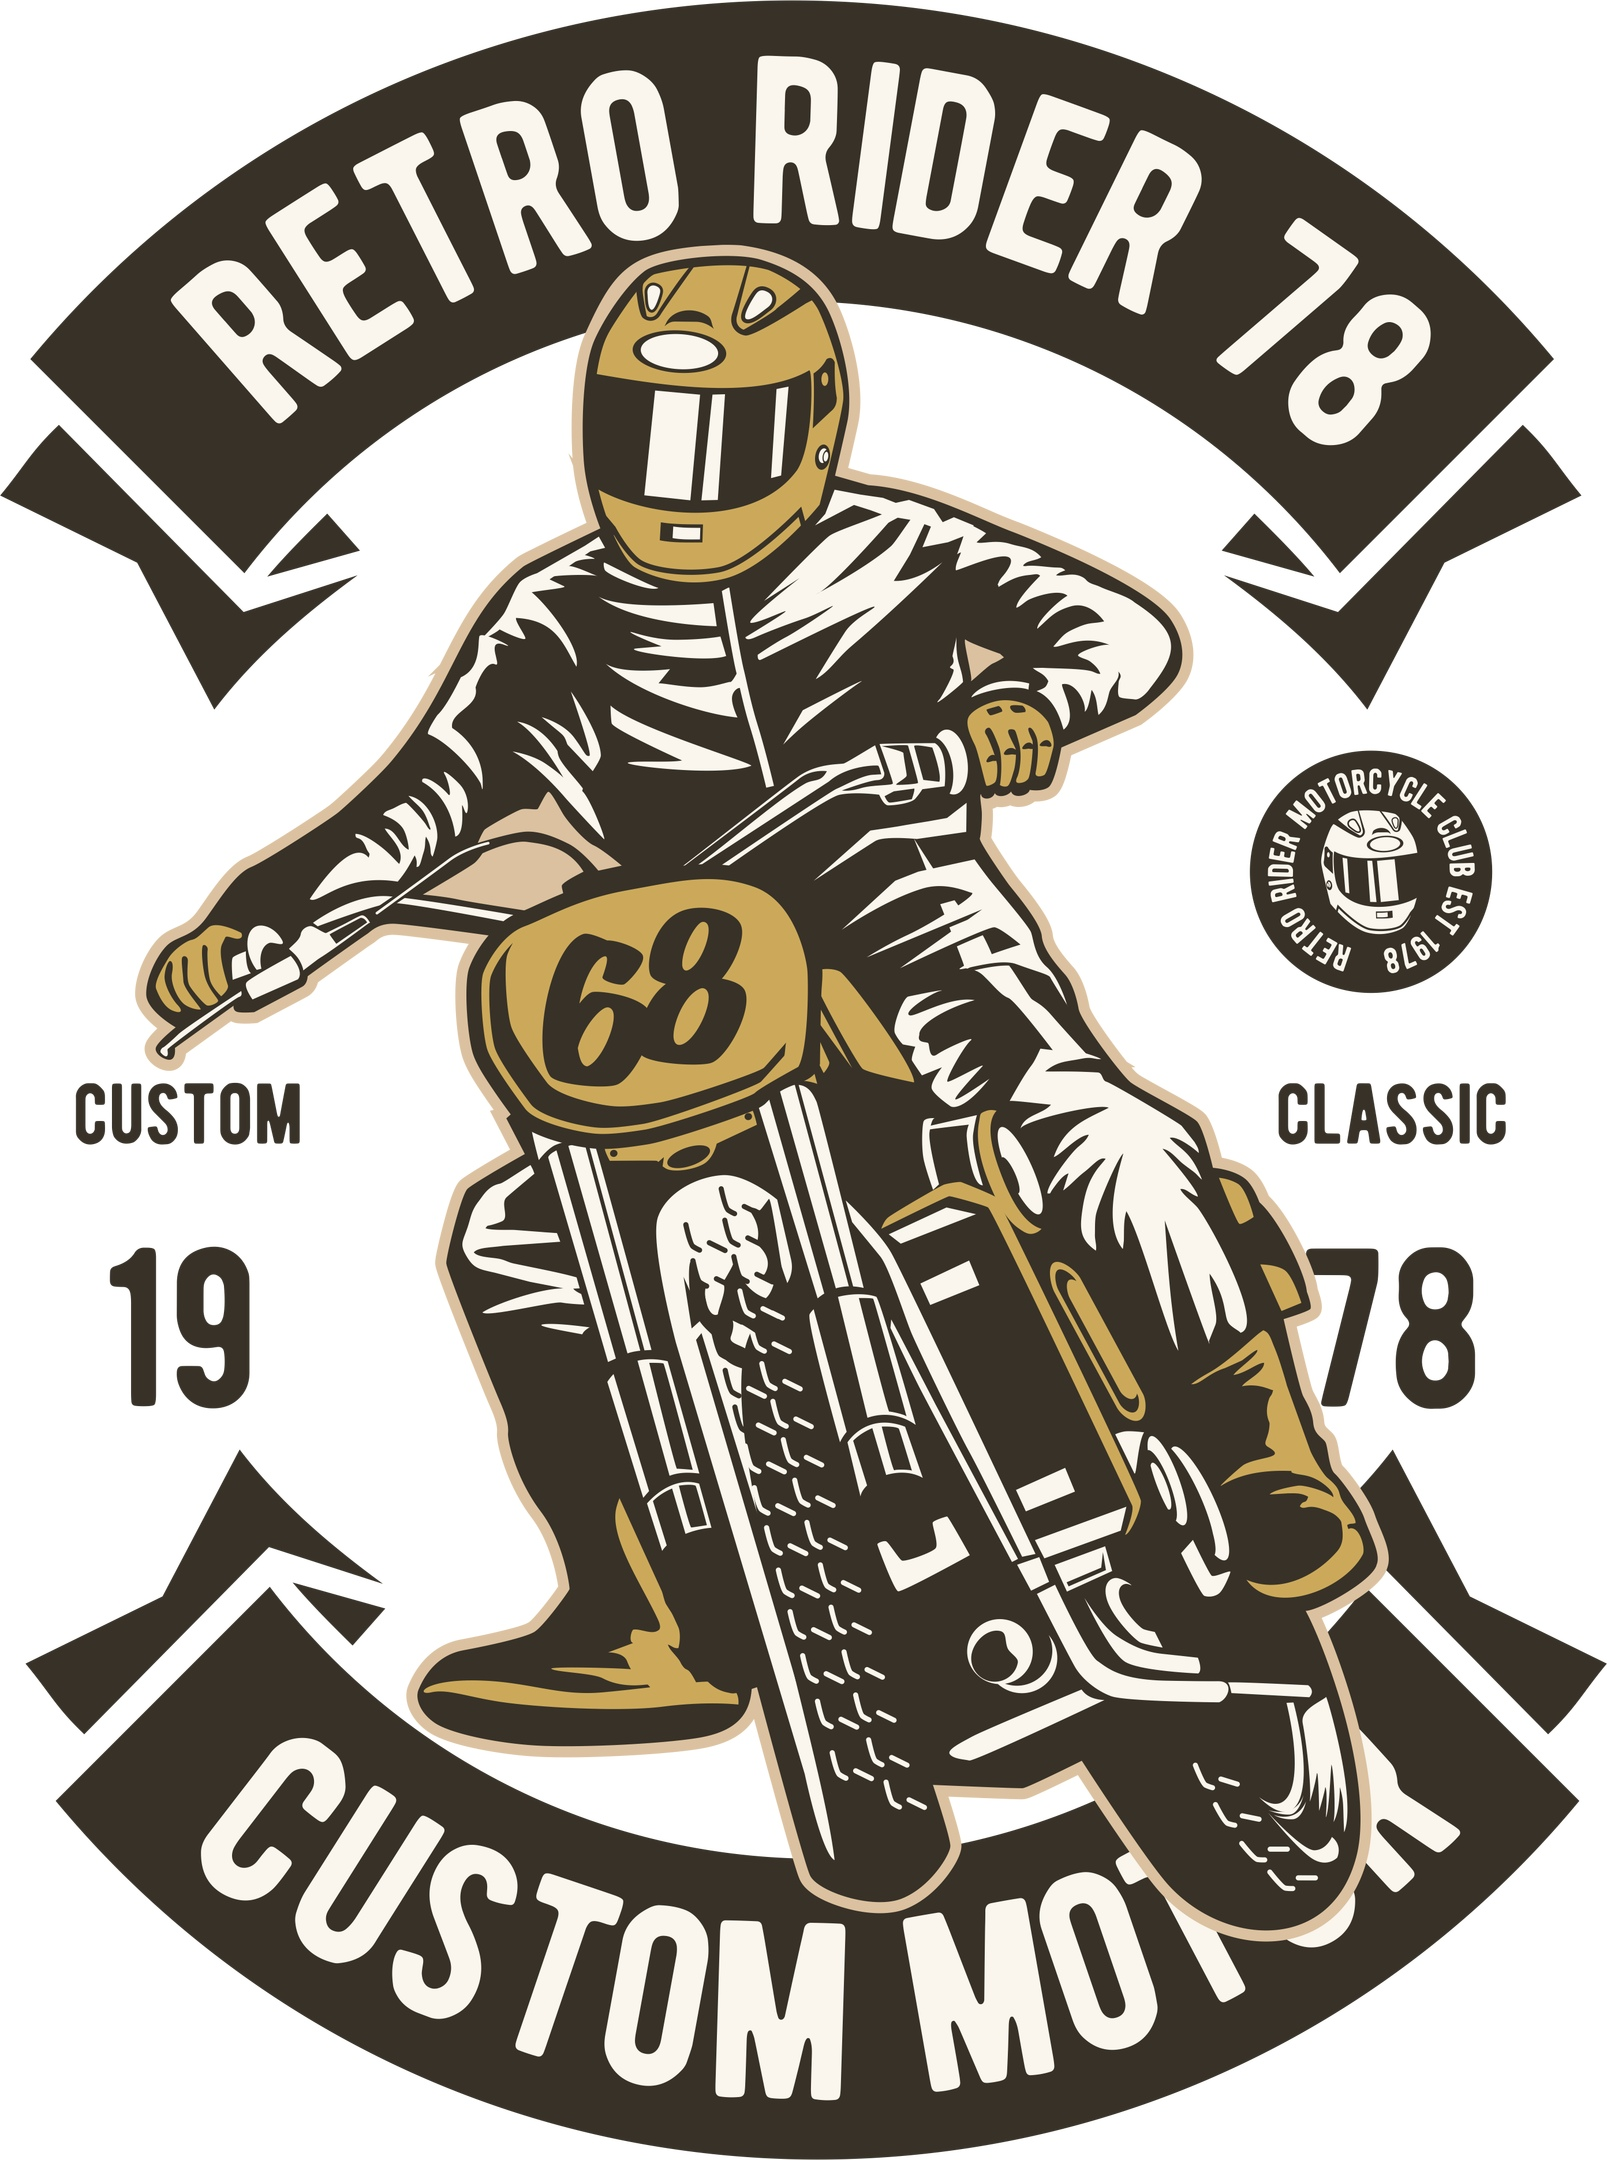 Retro Rider Print Free Vector Cdr Download 3axis Co Free T Shirt Design Retro Shirt Design Vector Free